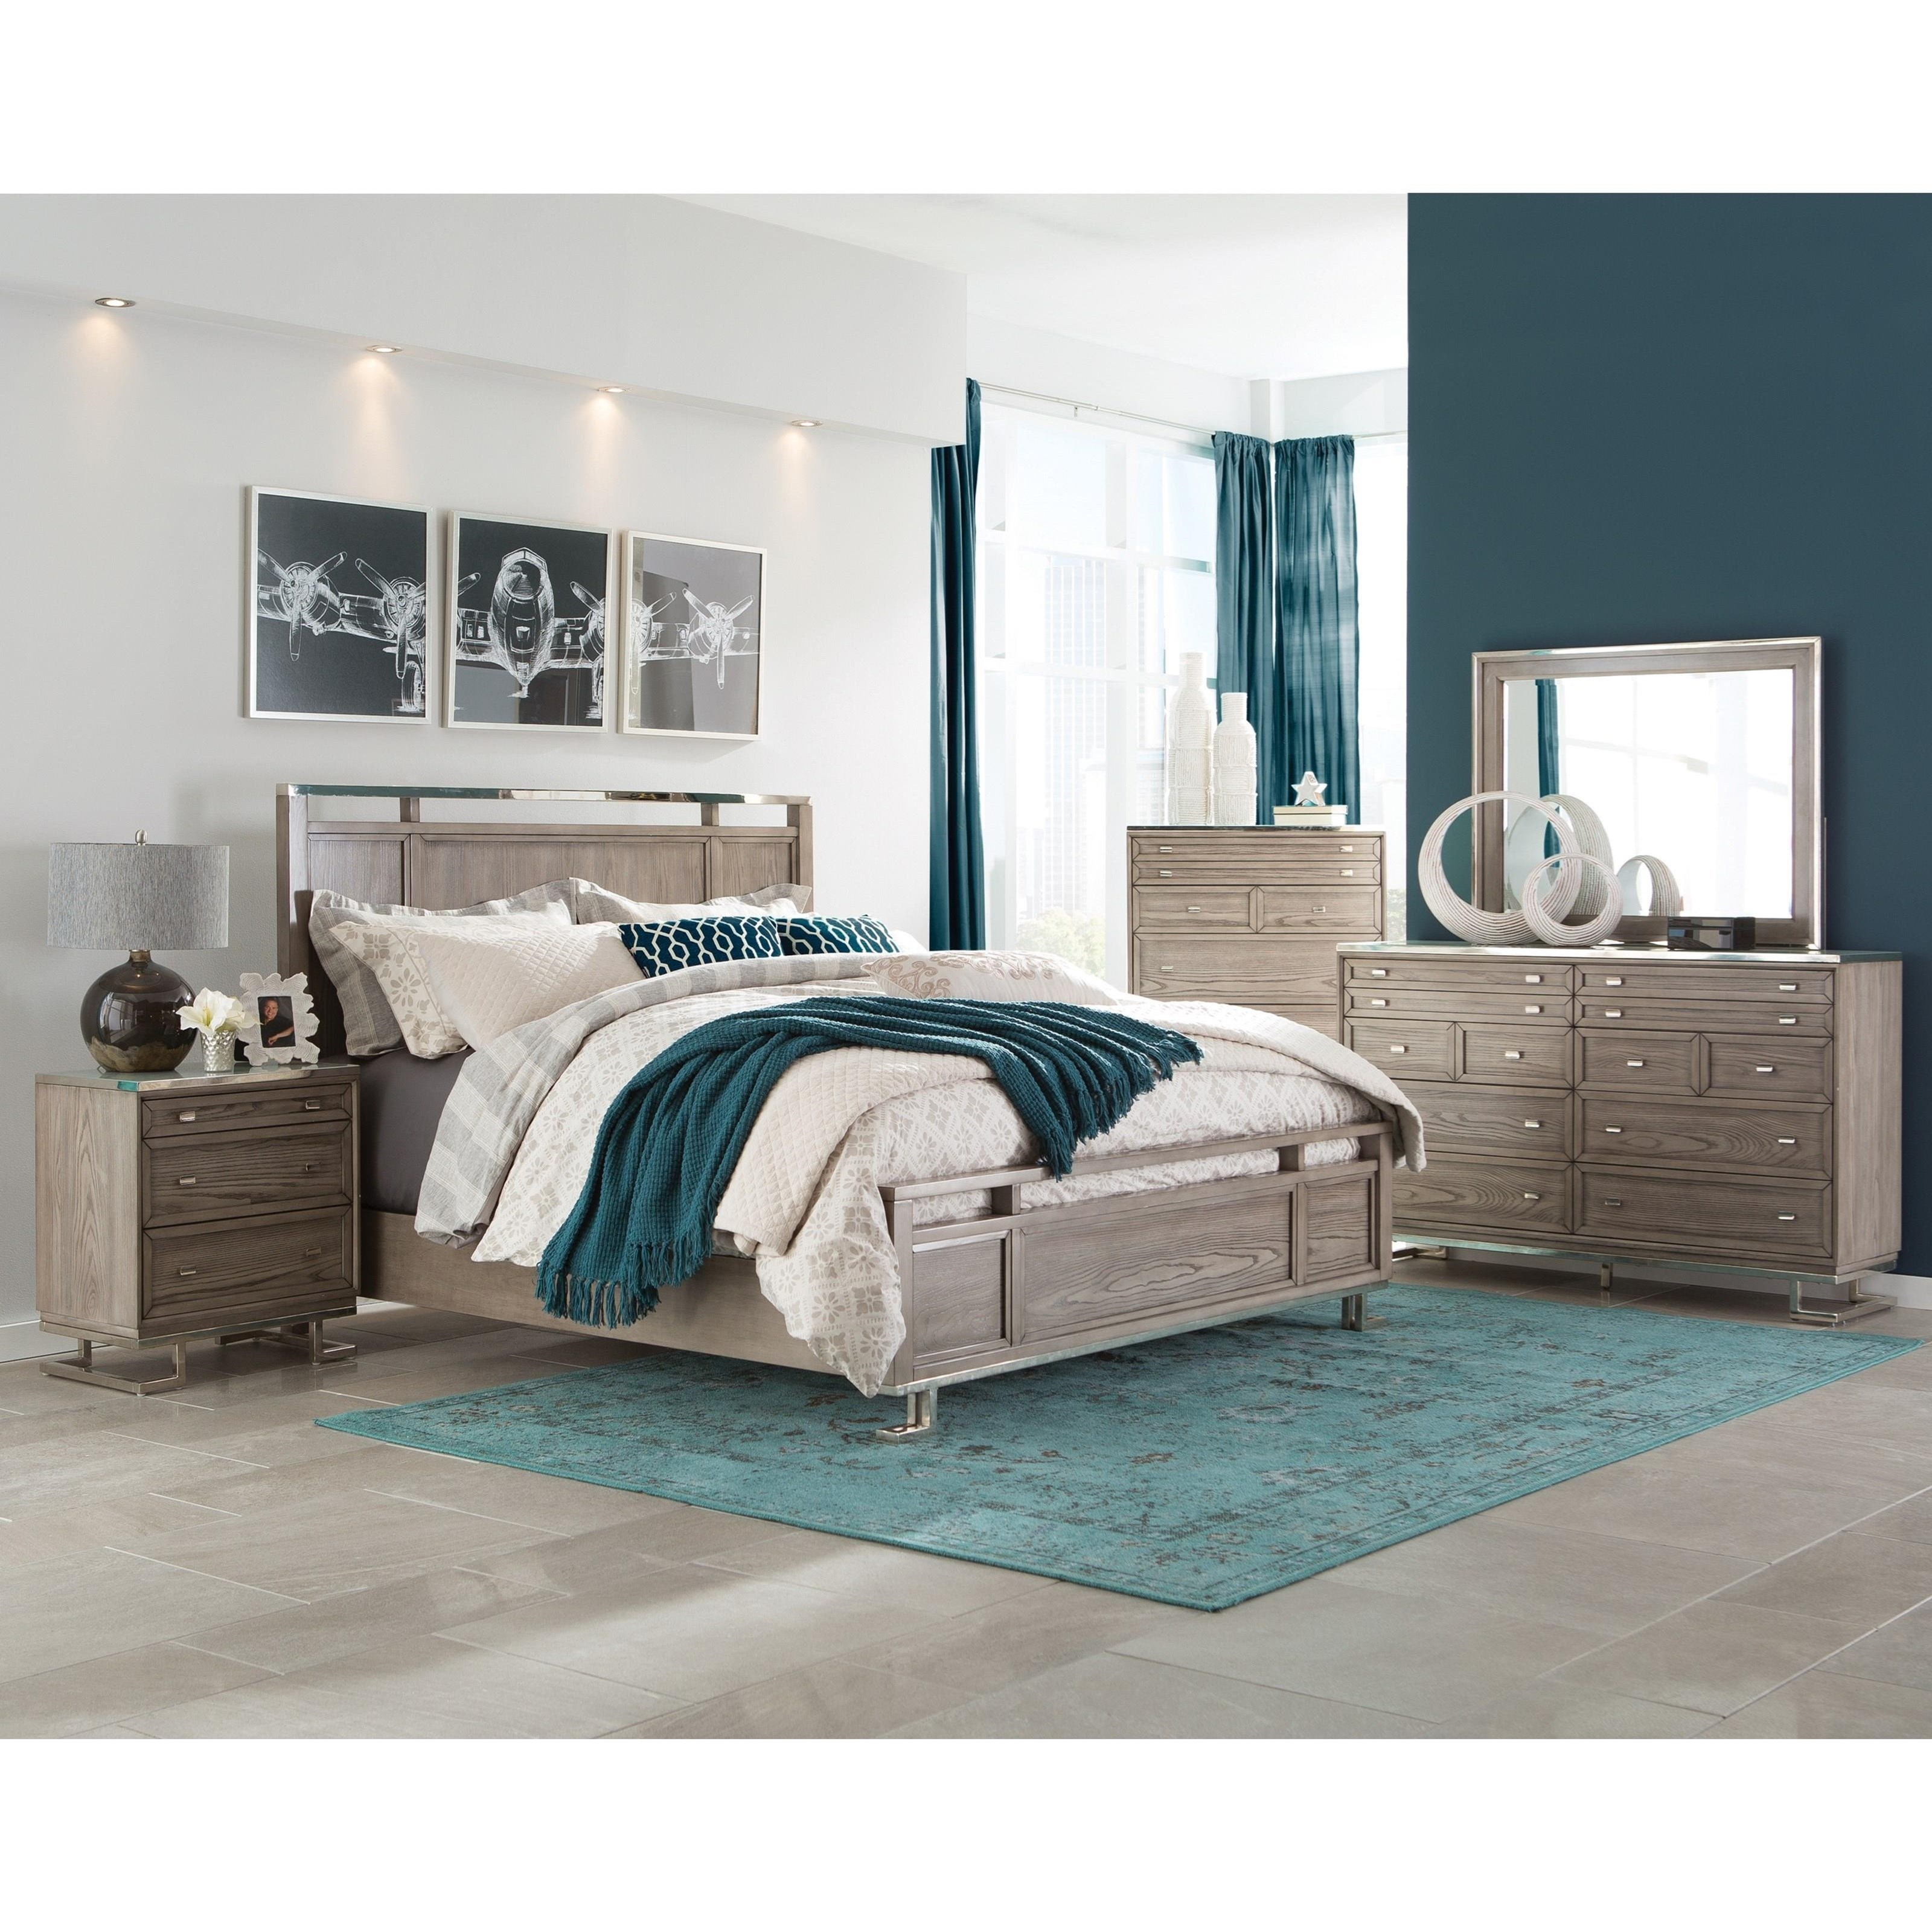 donny osmond home johnathan 205193 modern dresser with white glass top del sol furniture. Black Bedroom Furniture Sets. Home Design Ideas